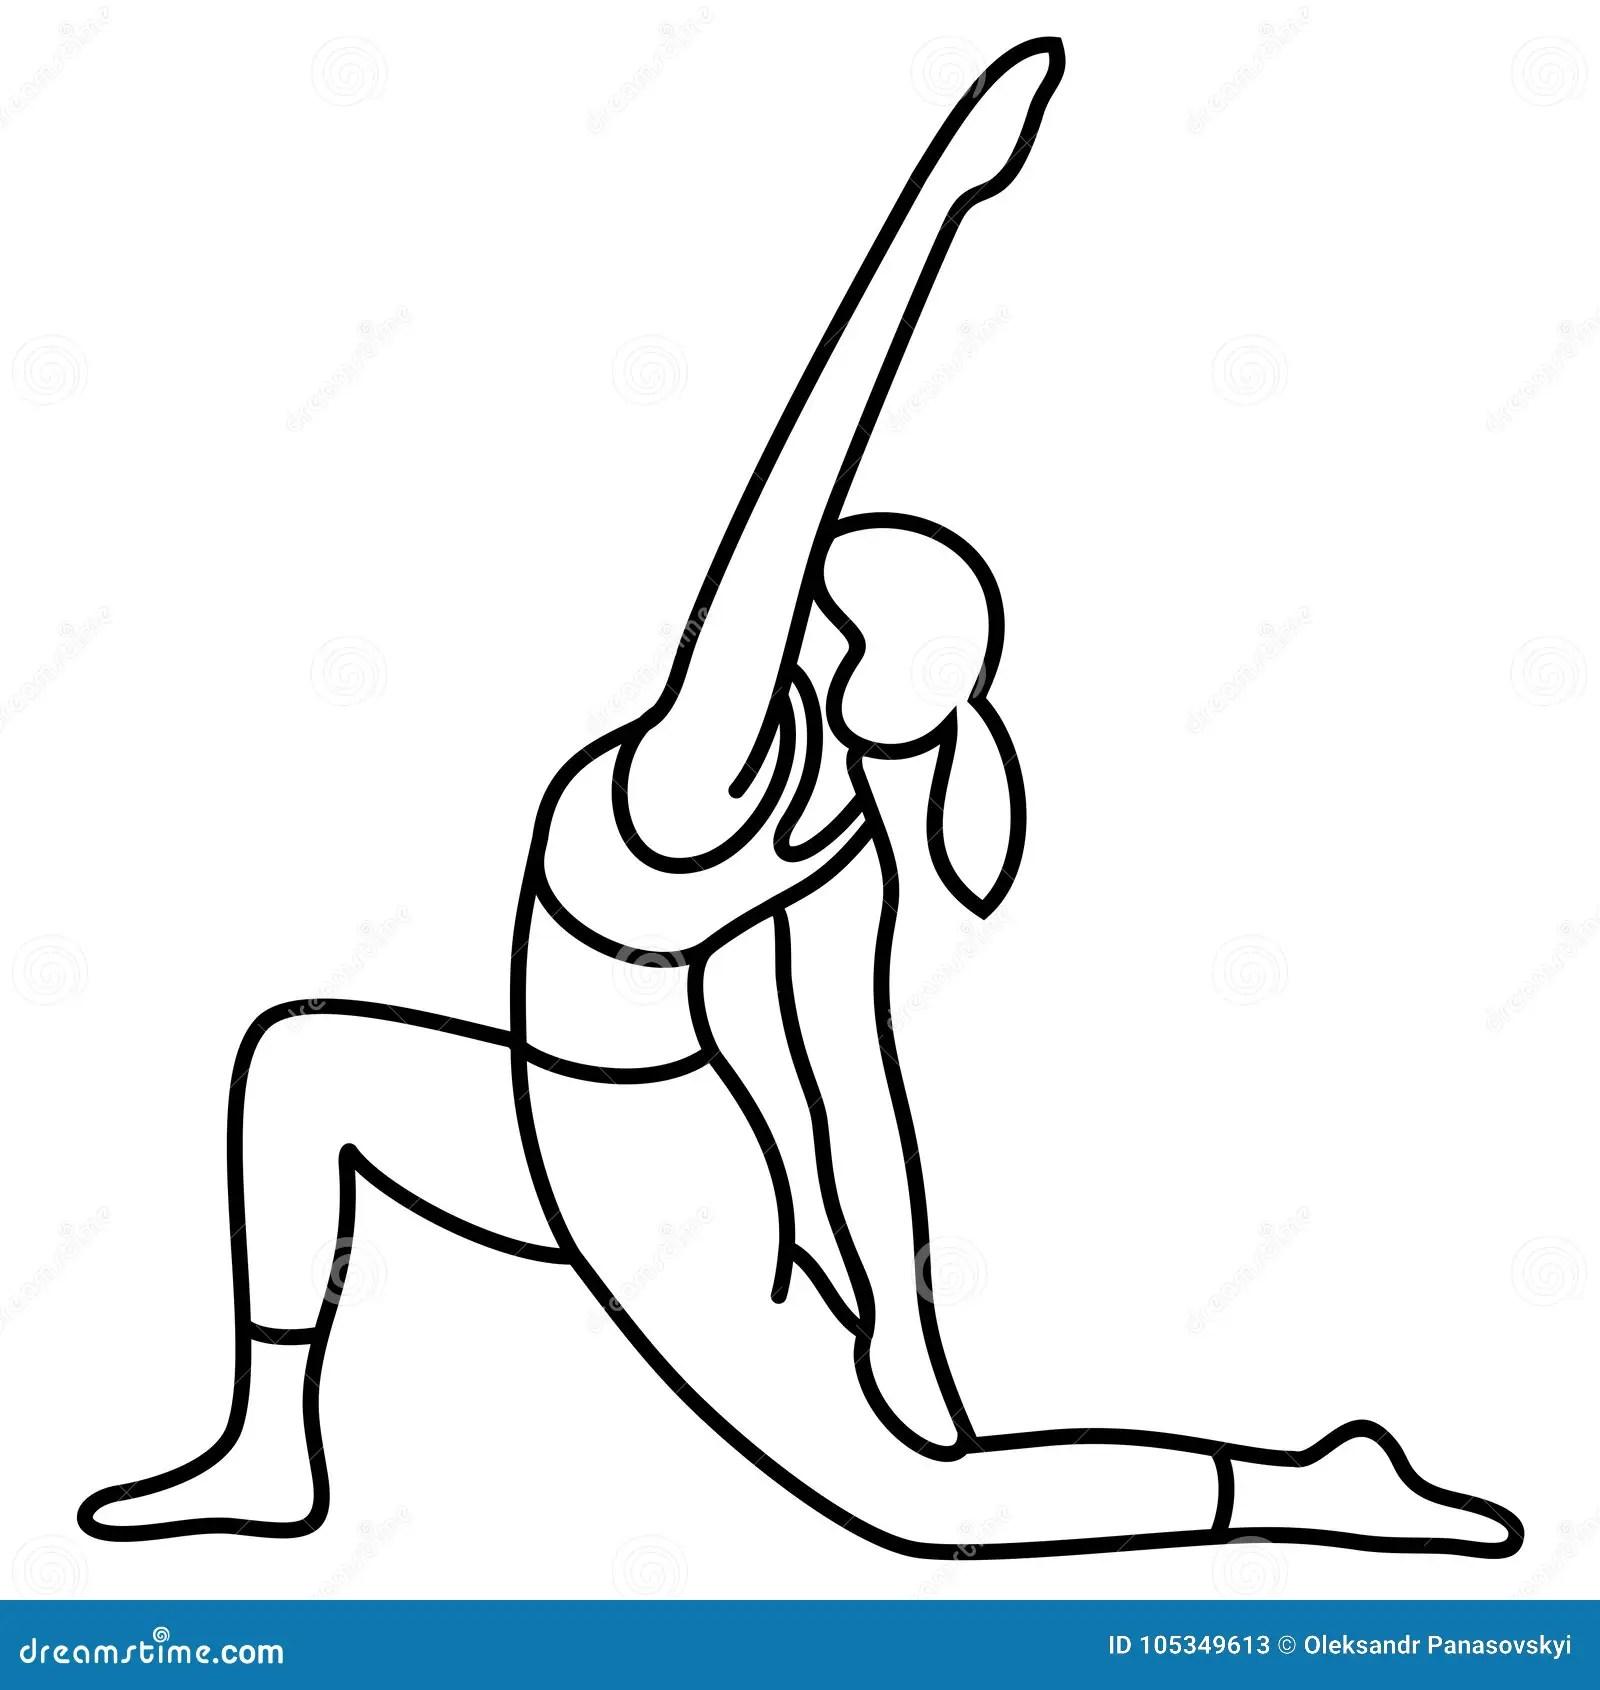 Yoga Pose Asana Pose Posture Vector Flat Outlines Stock